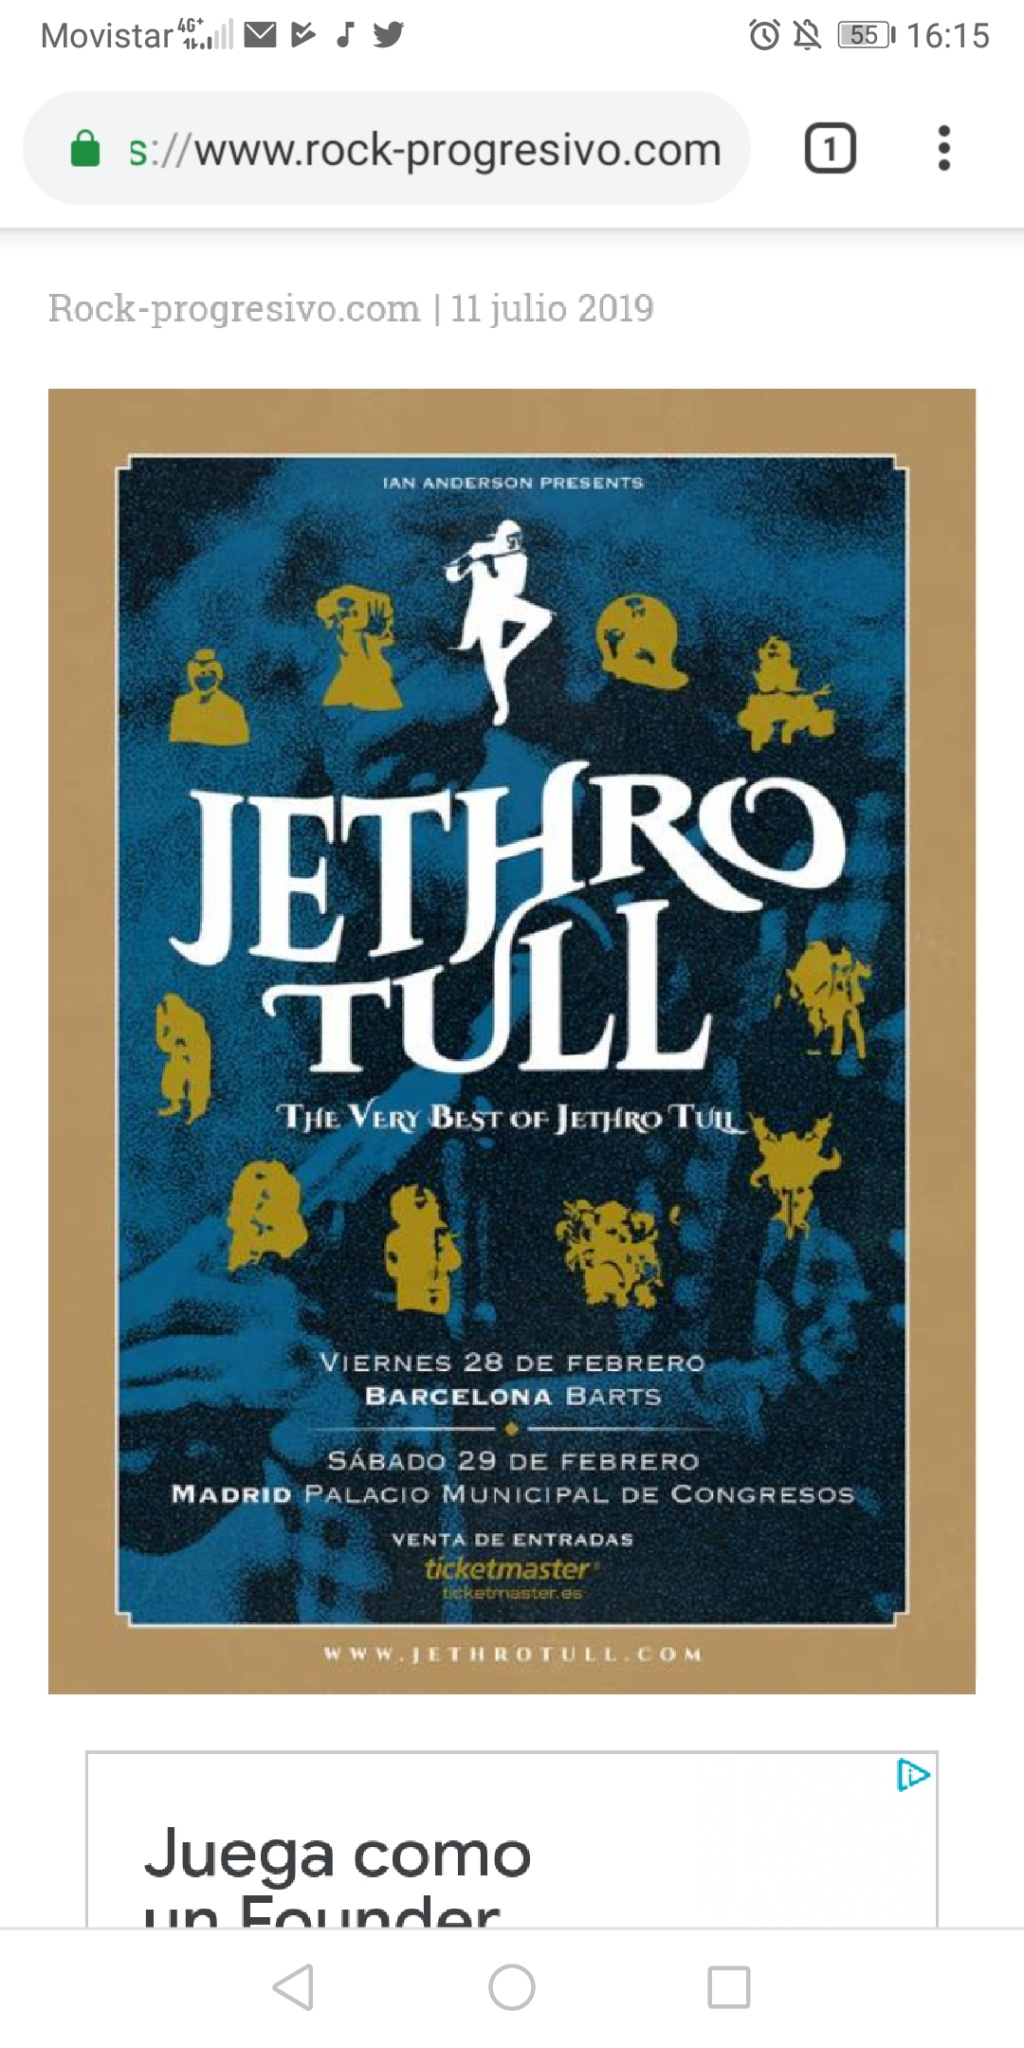 JETHRO TULL(TODA LA PUTA SEMANA) - Página 8 Screen21